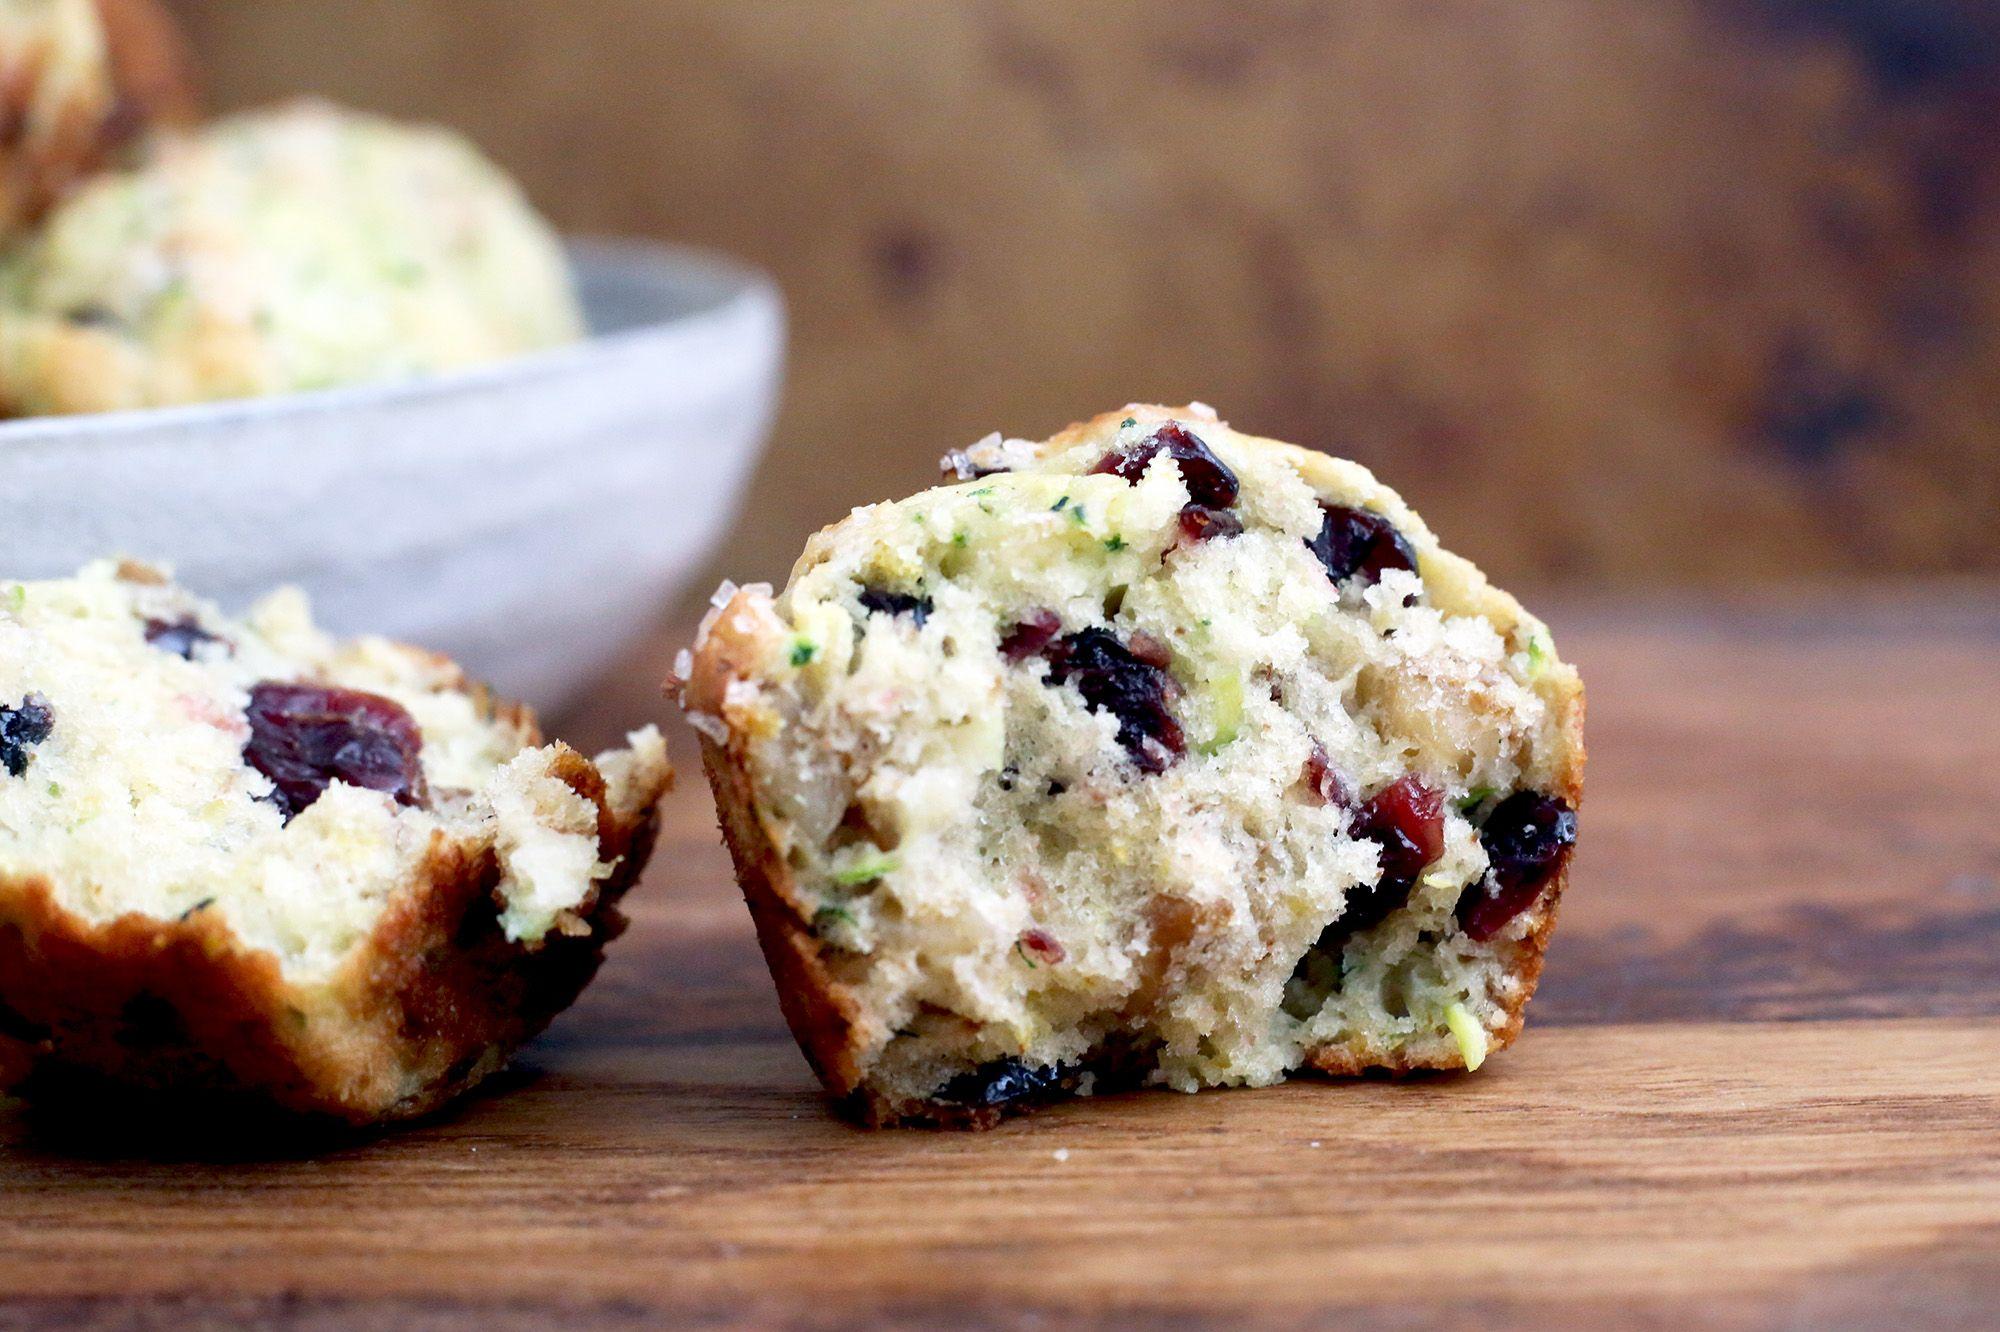 Glutenfree blueberry muffins made with baking mix